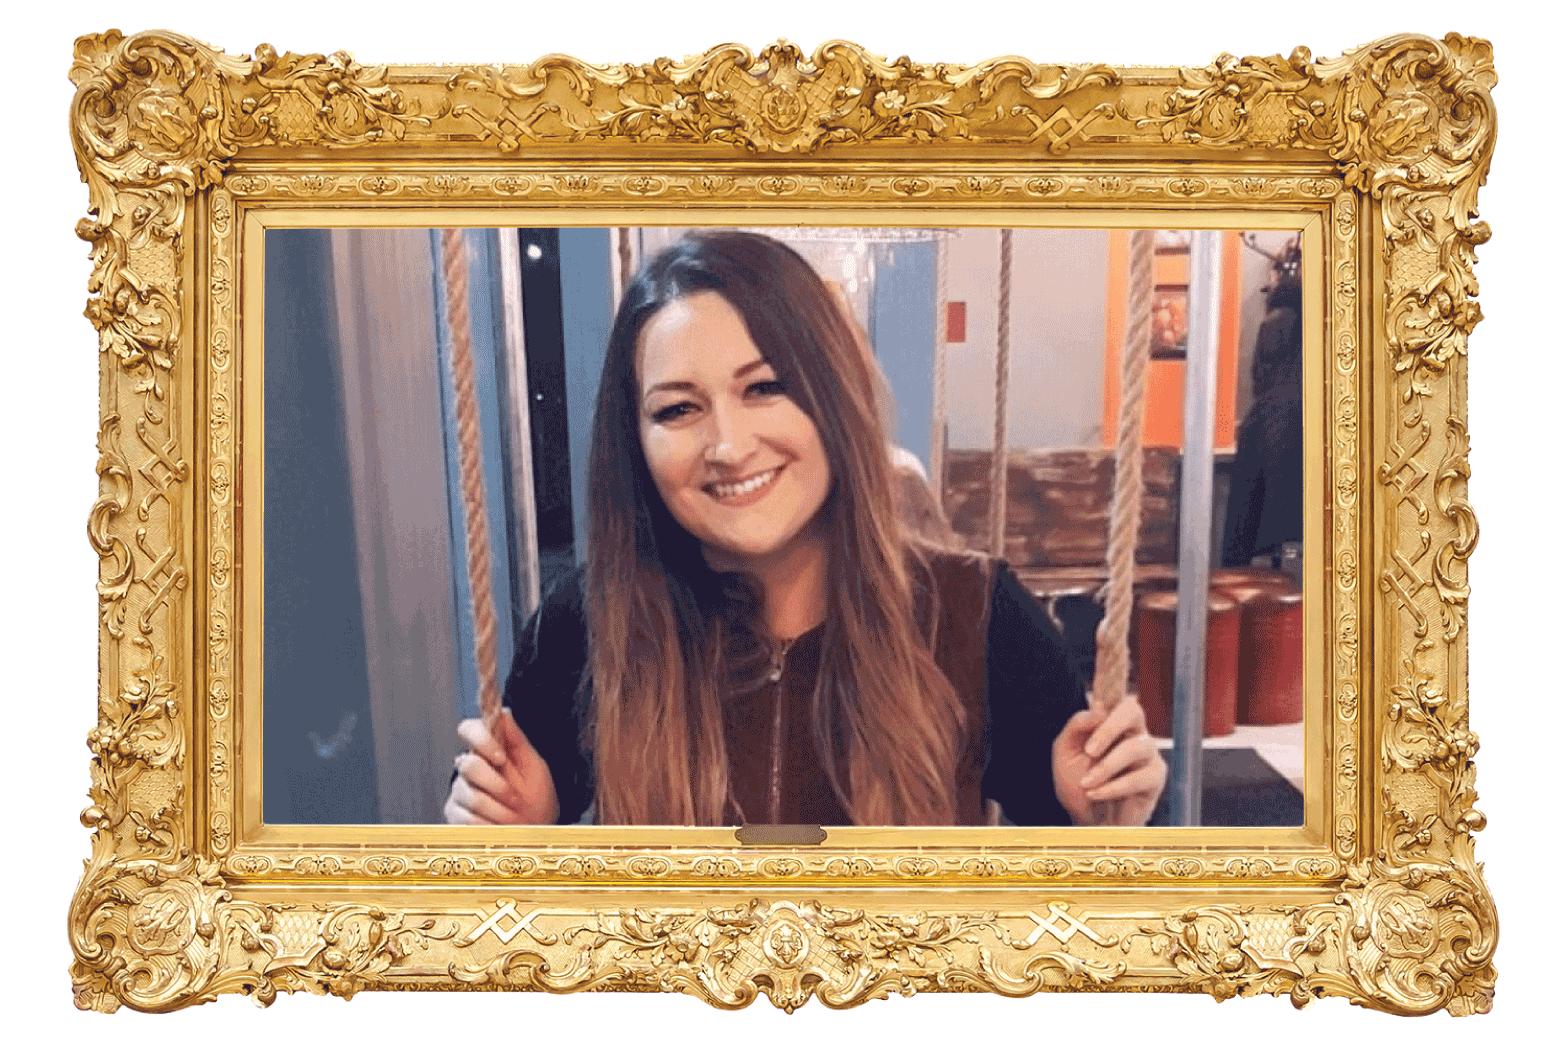 Beauty Therapist Mhairi at Clarity House Dunfermline